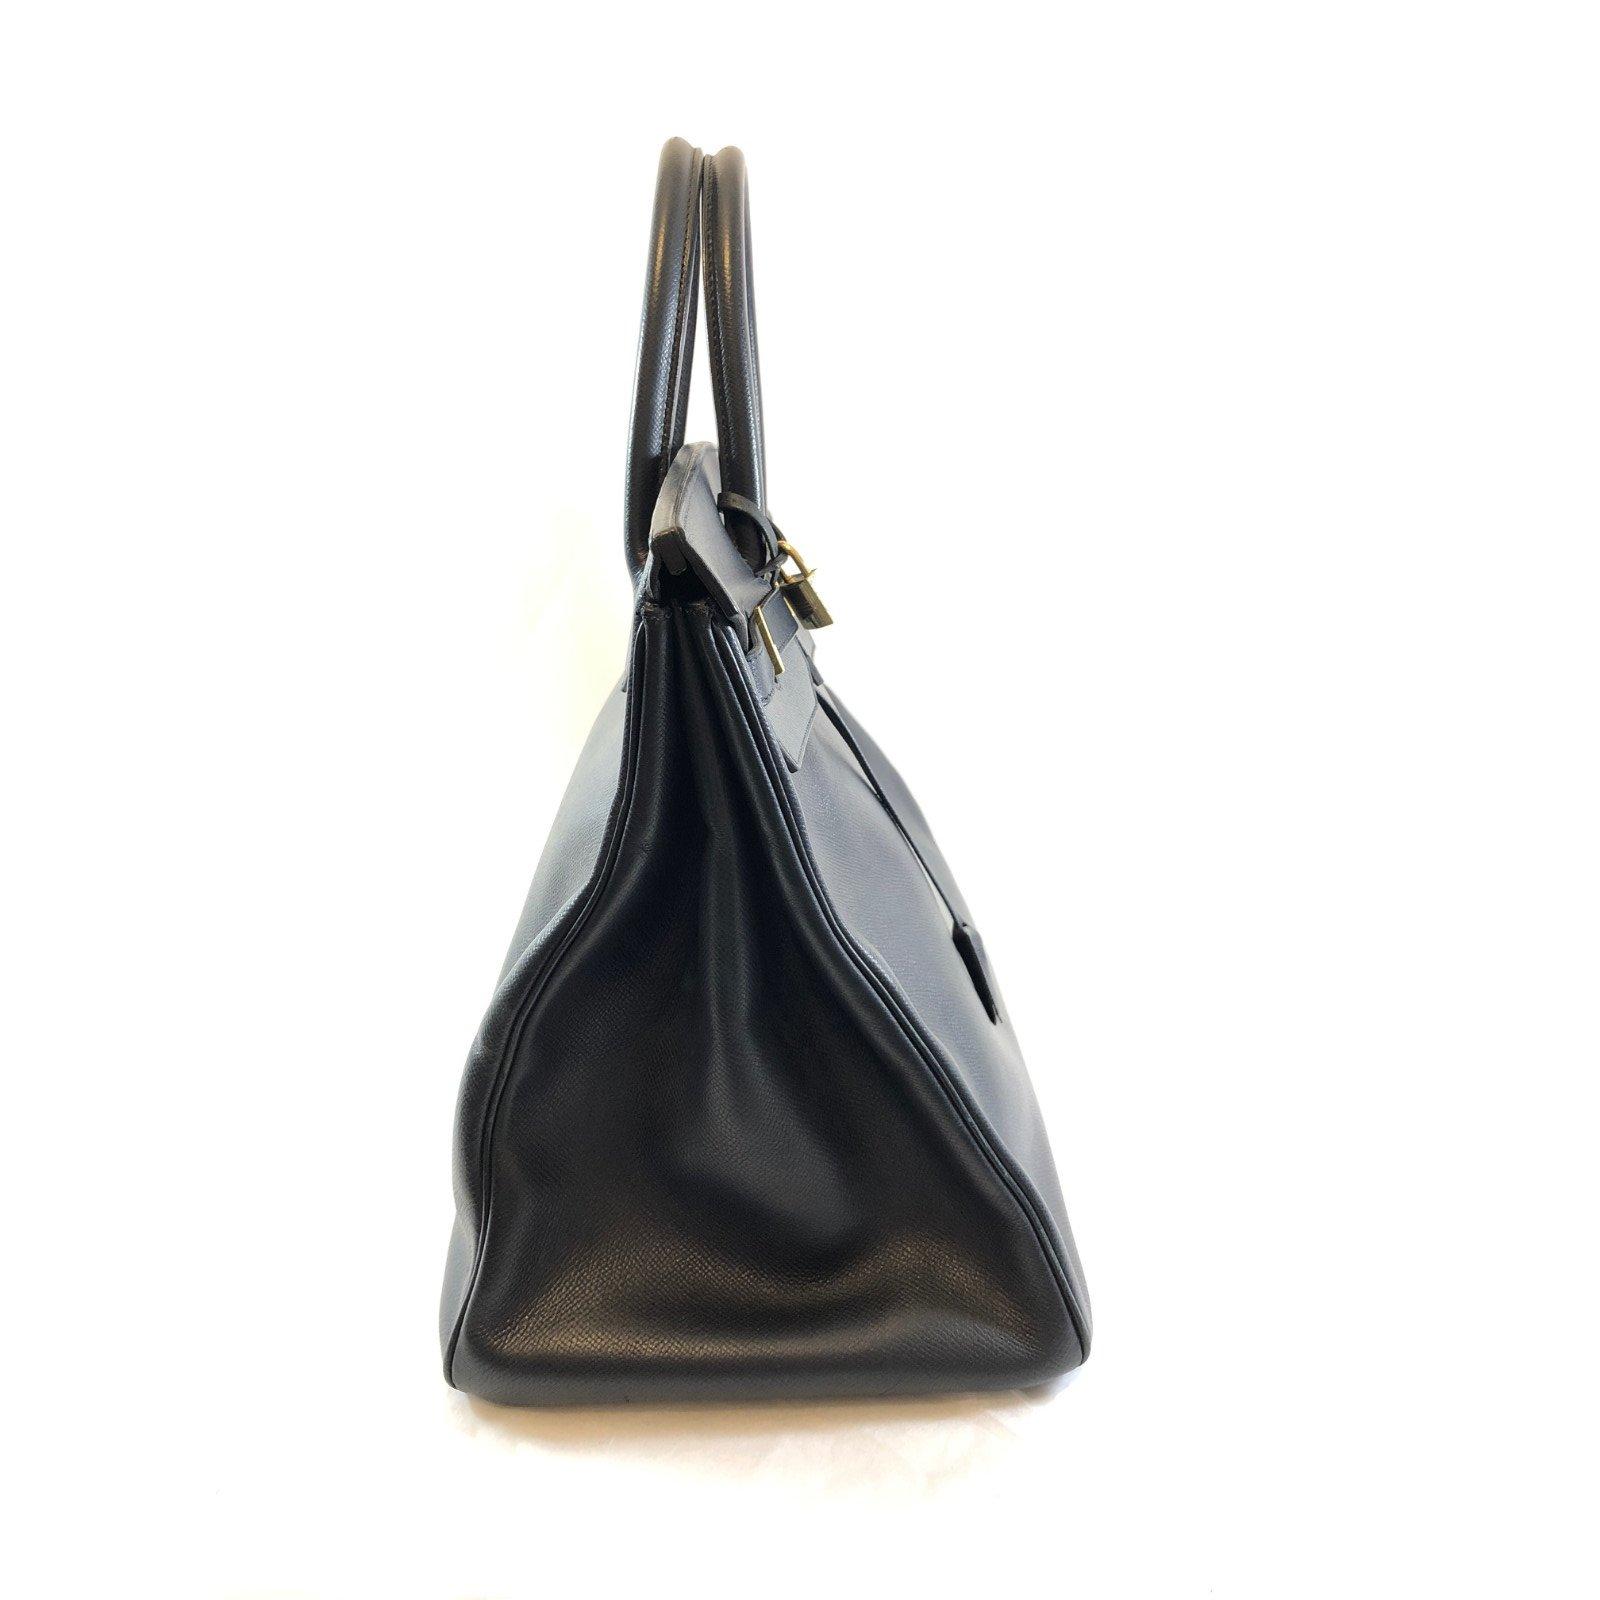 06f4c0a9adc Hermès Birkin 40 Handbags Leather Navy blue ref.66011 - Joli Closet